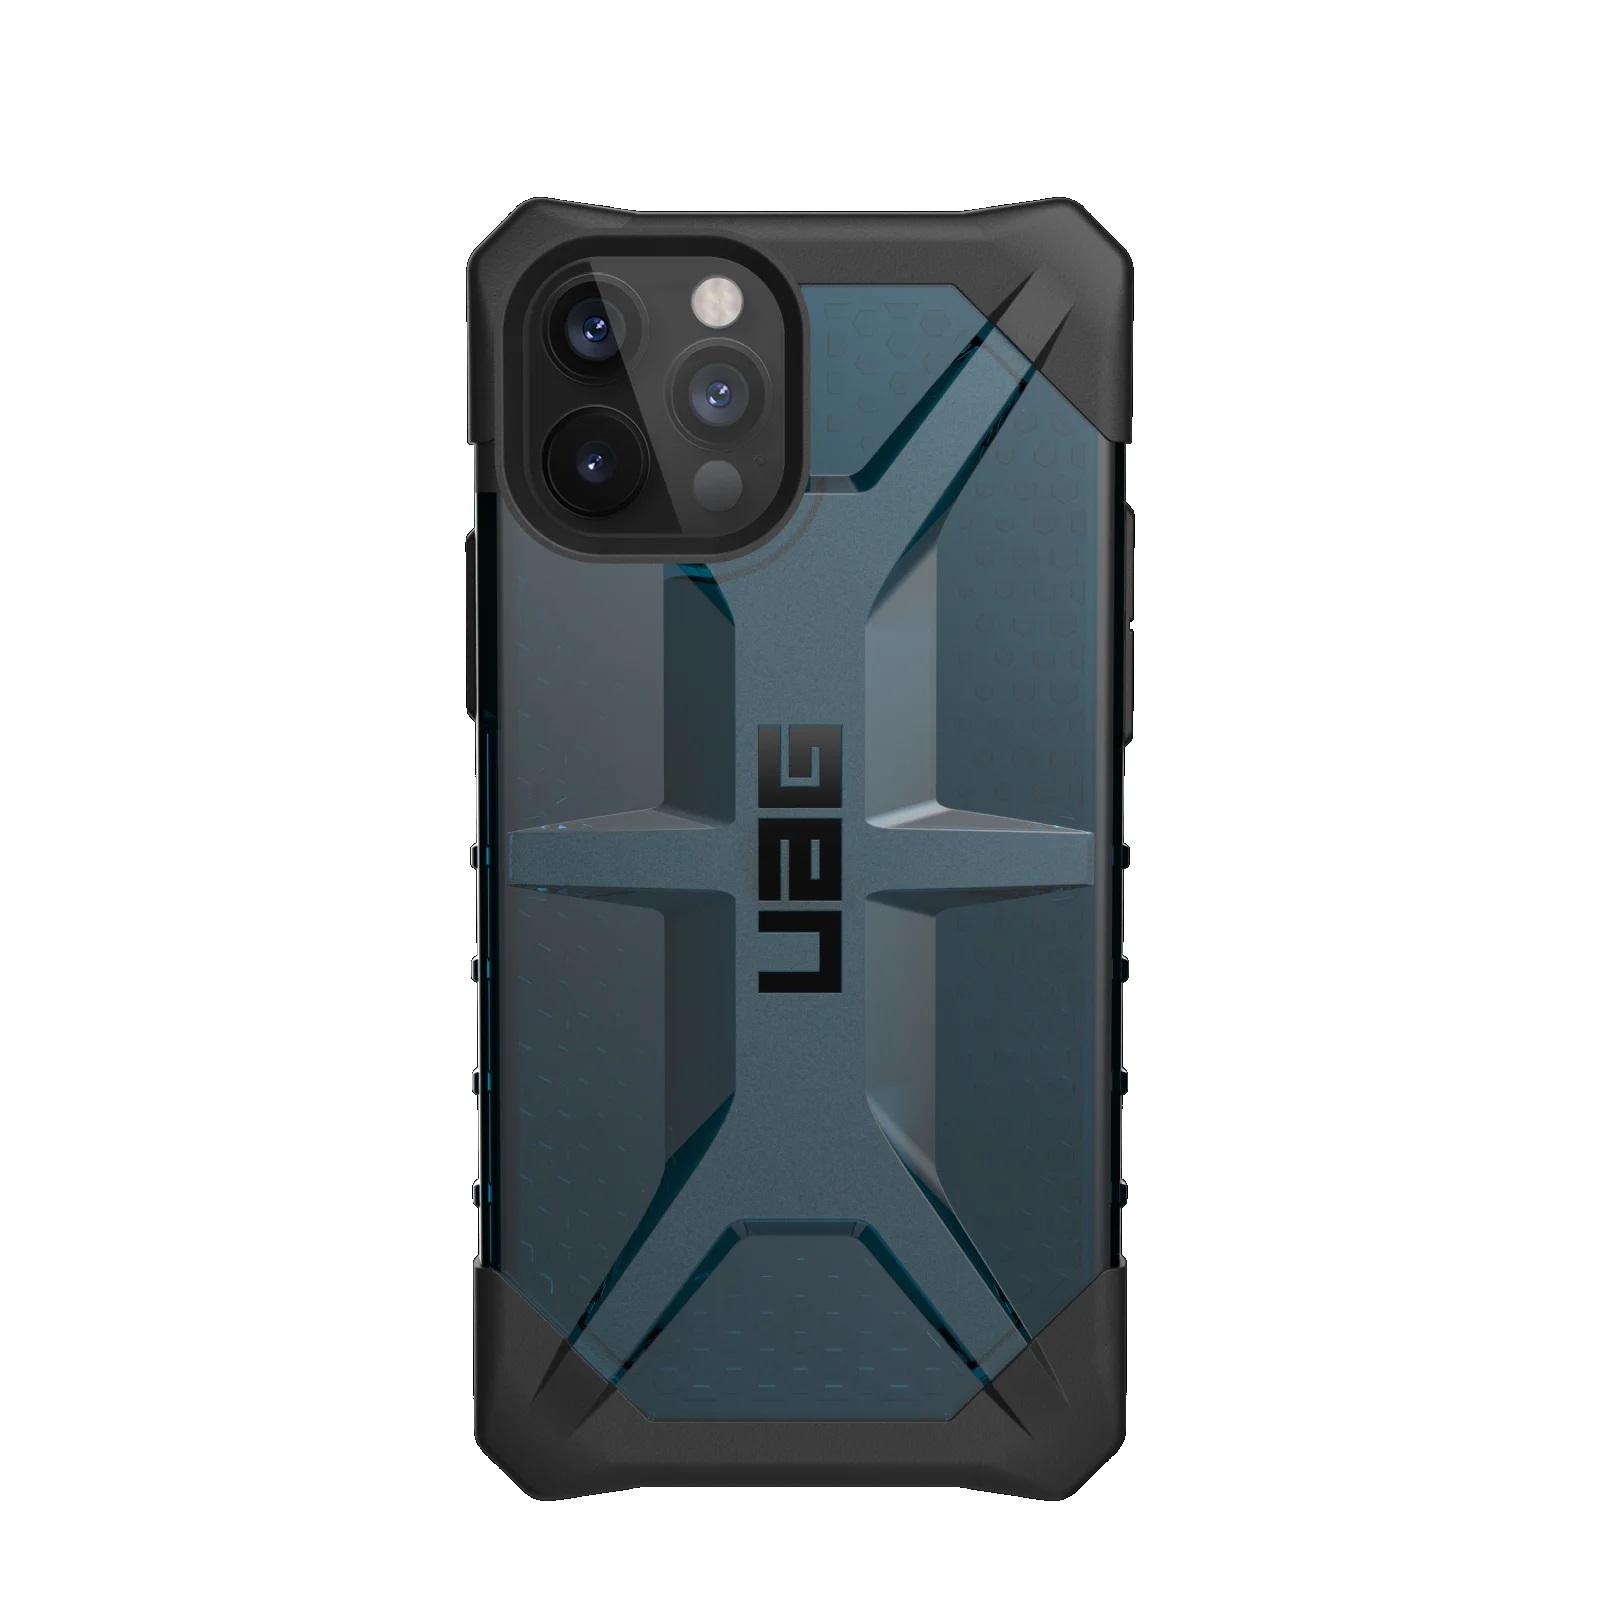 "Urban Armor Gear APPLE MILLENIUM 2 PLASMA ACCS funda para teléfono móvil 17 cm (6.7"") Negro, Azul, Transparente"